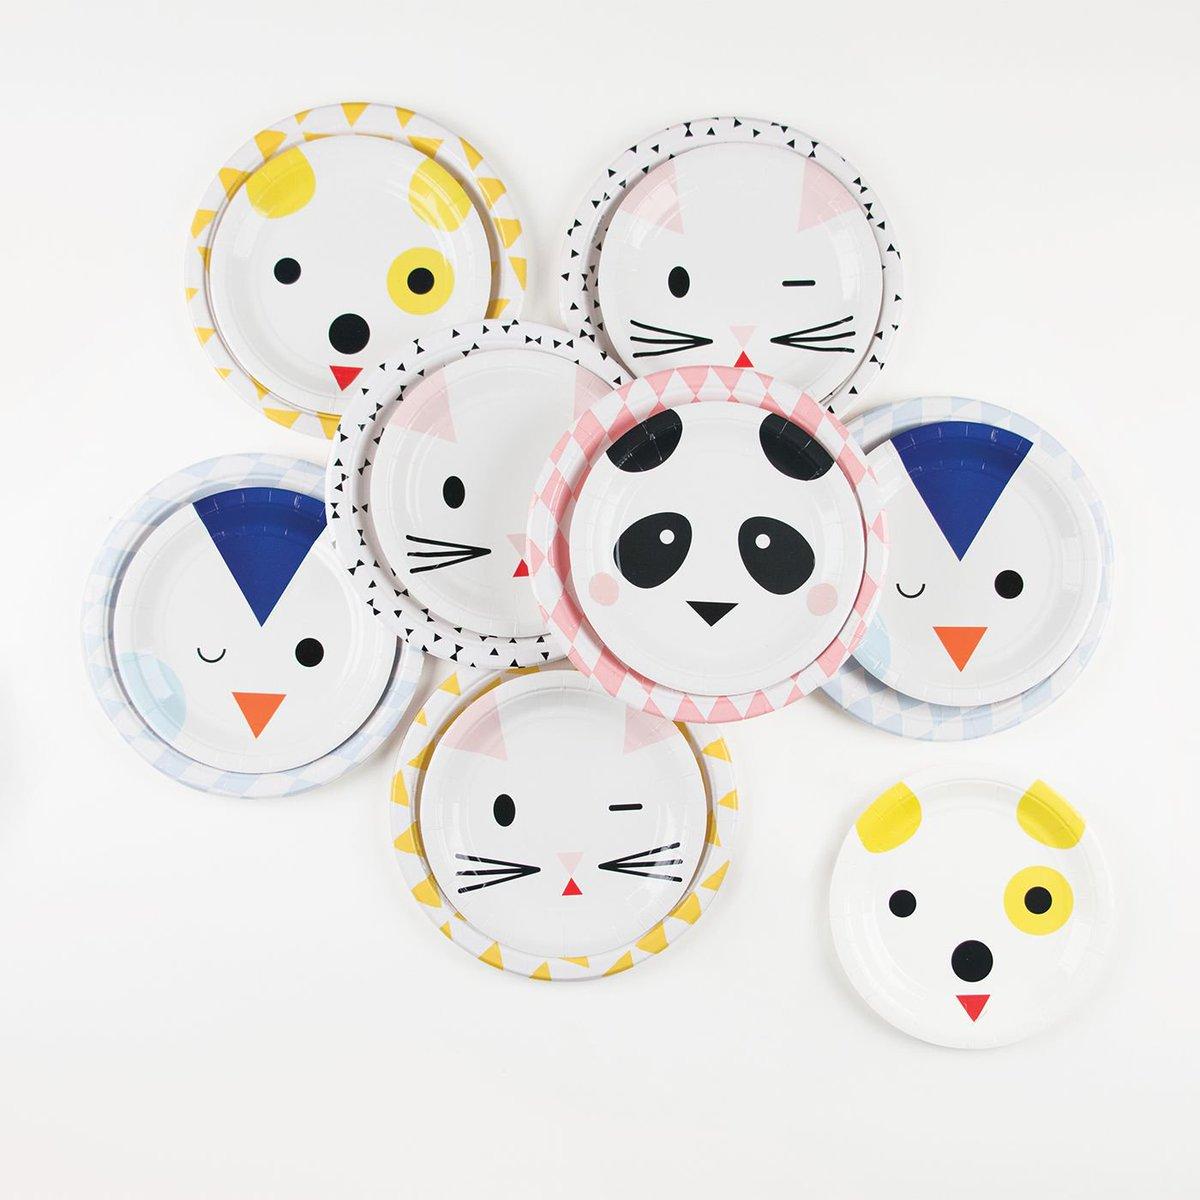 Les nouvelles assiettes mini animaux nous font craquer ! Adopt the sweetest cats, dogs, pandas and penguins ! #new  http:// mlday.fr/2lpNBr9  &nbsp;  <br>http://pic.twitter.com/u7R9hPs76N